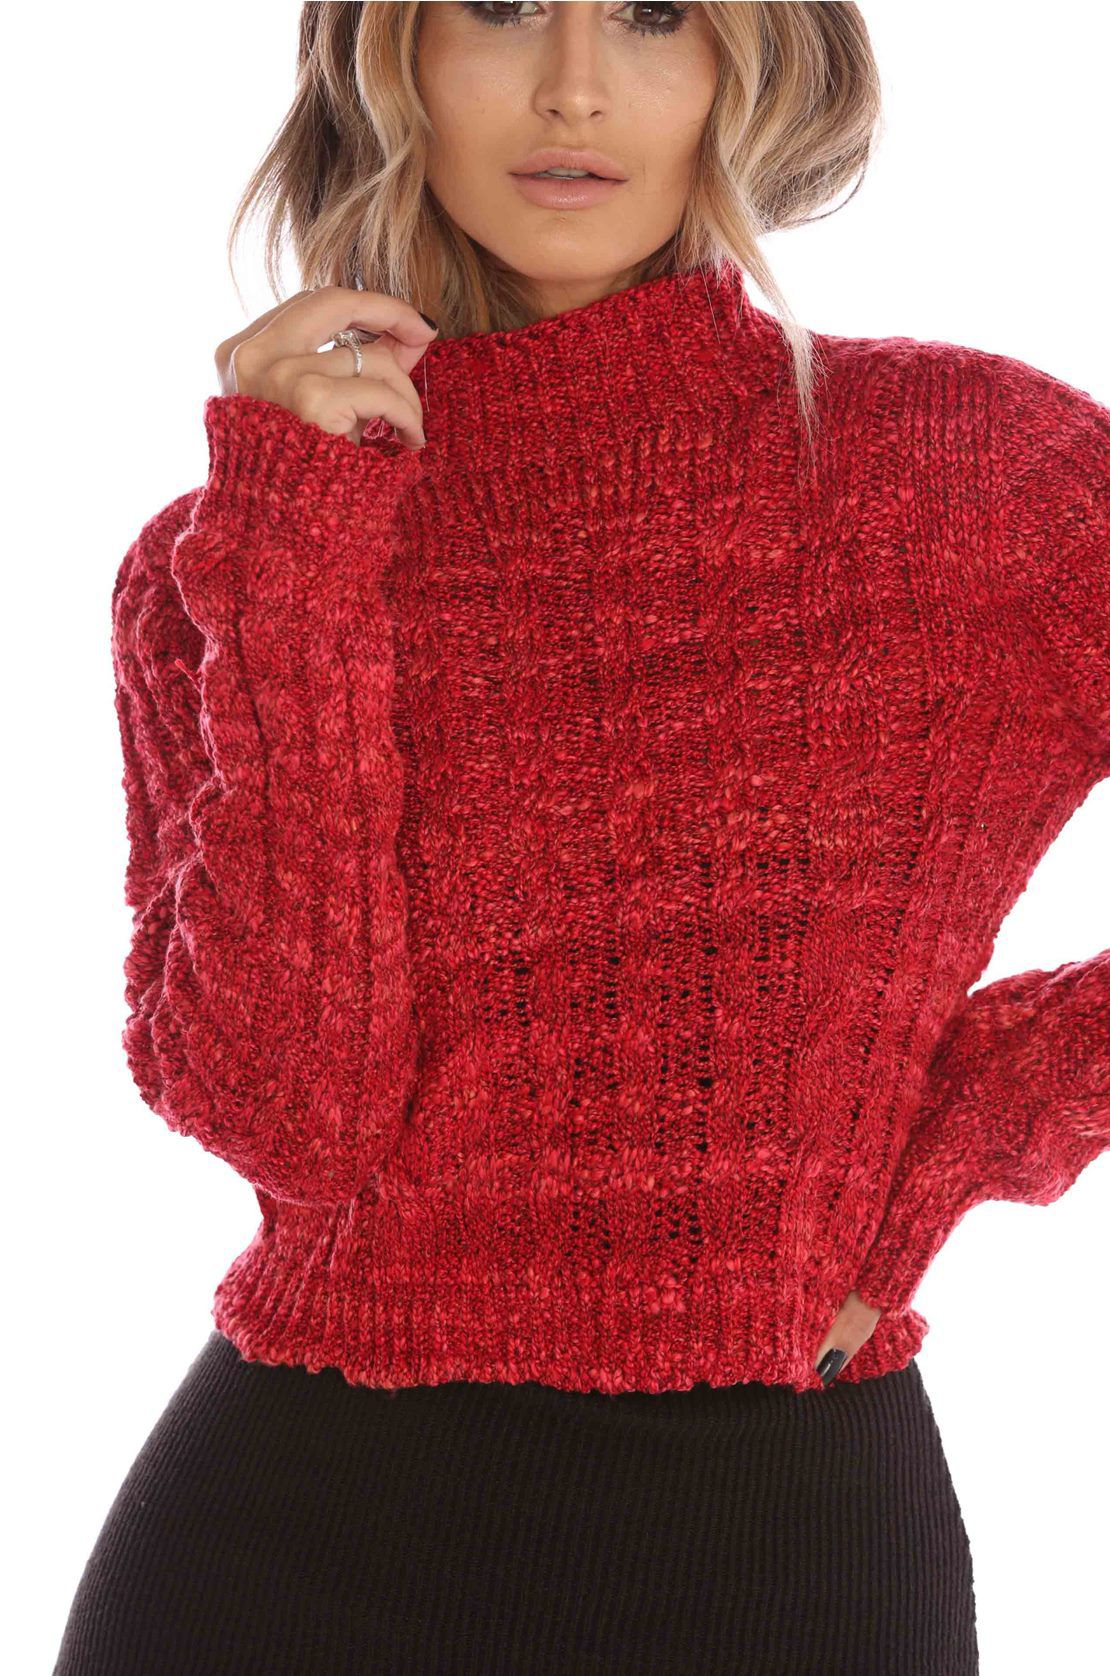 Blusa Cropped Vera Tricot Feminino Vermelho